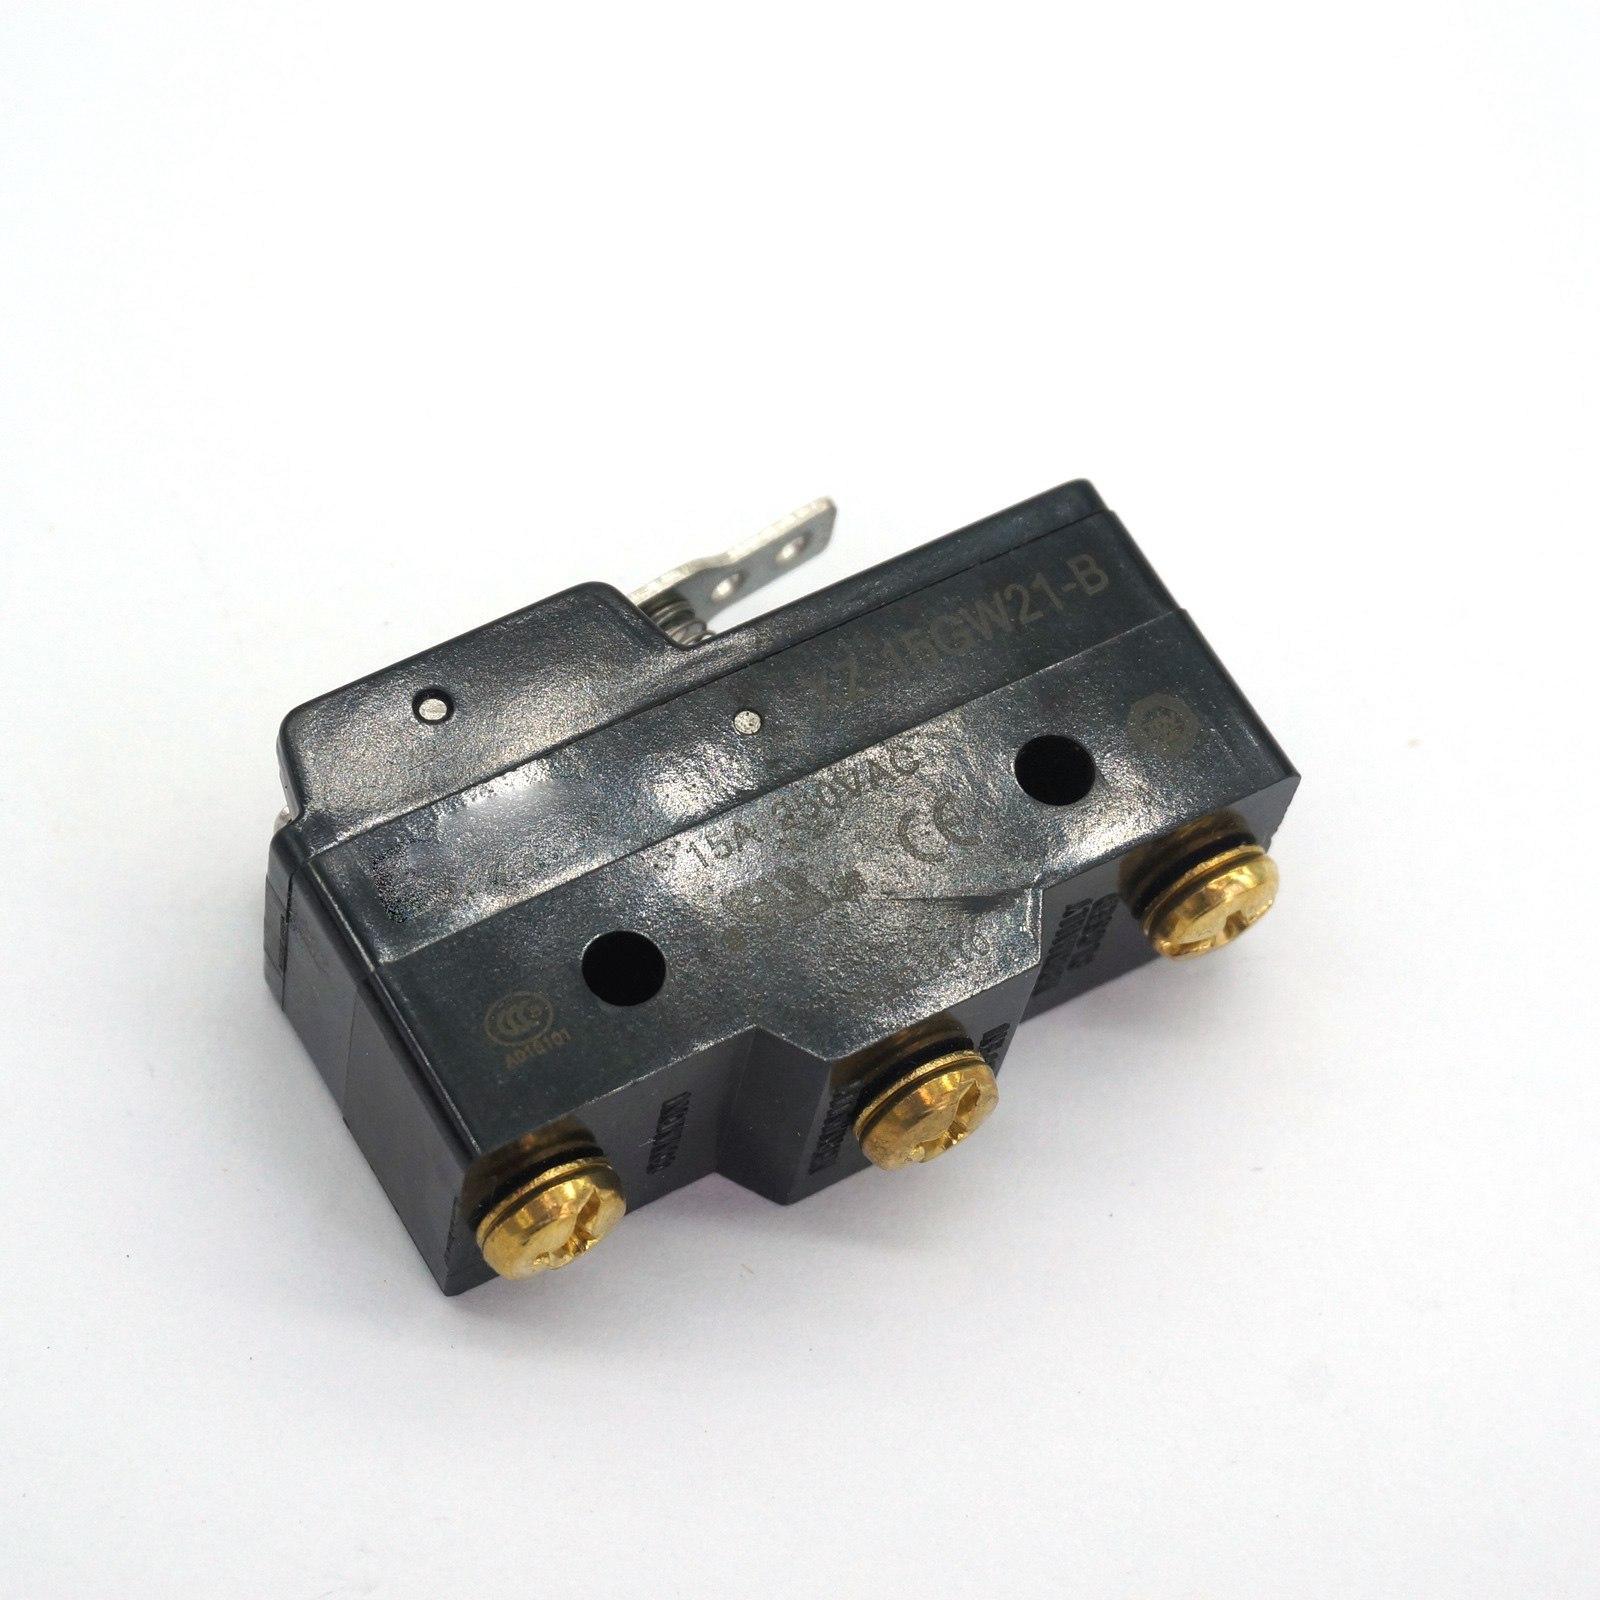 XZ-15GW21-B 15A 125VAC 3 Pin Spdt Micro Switch Korte Scharnier Lever Type IP40